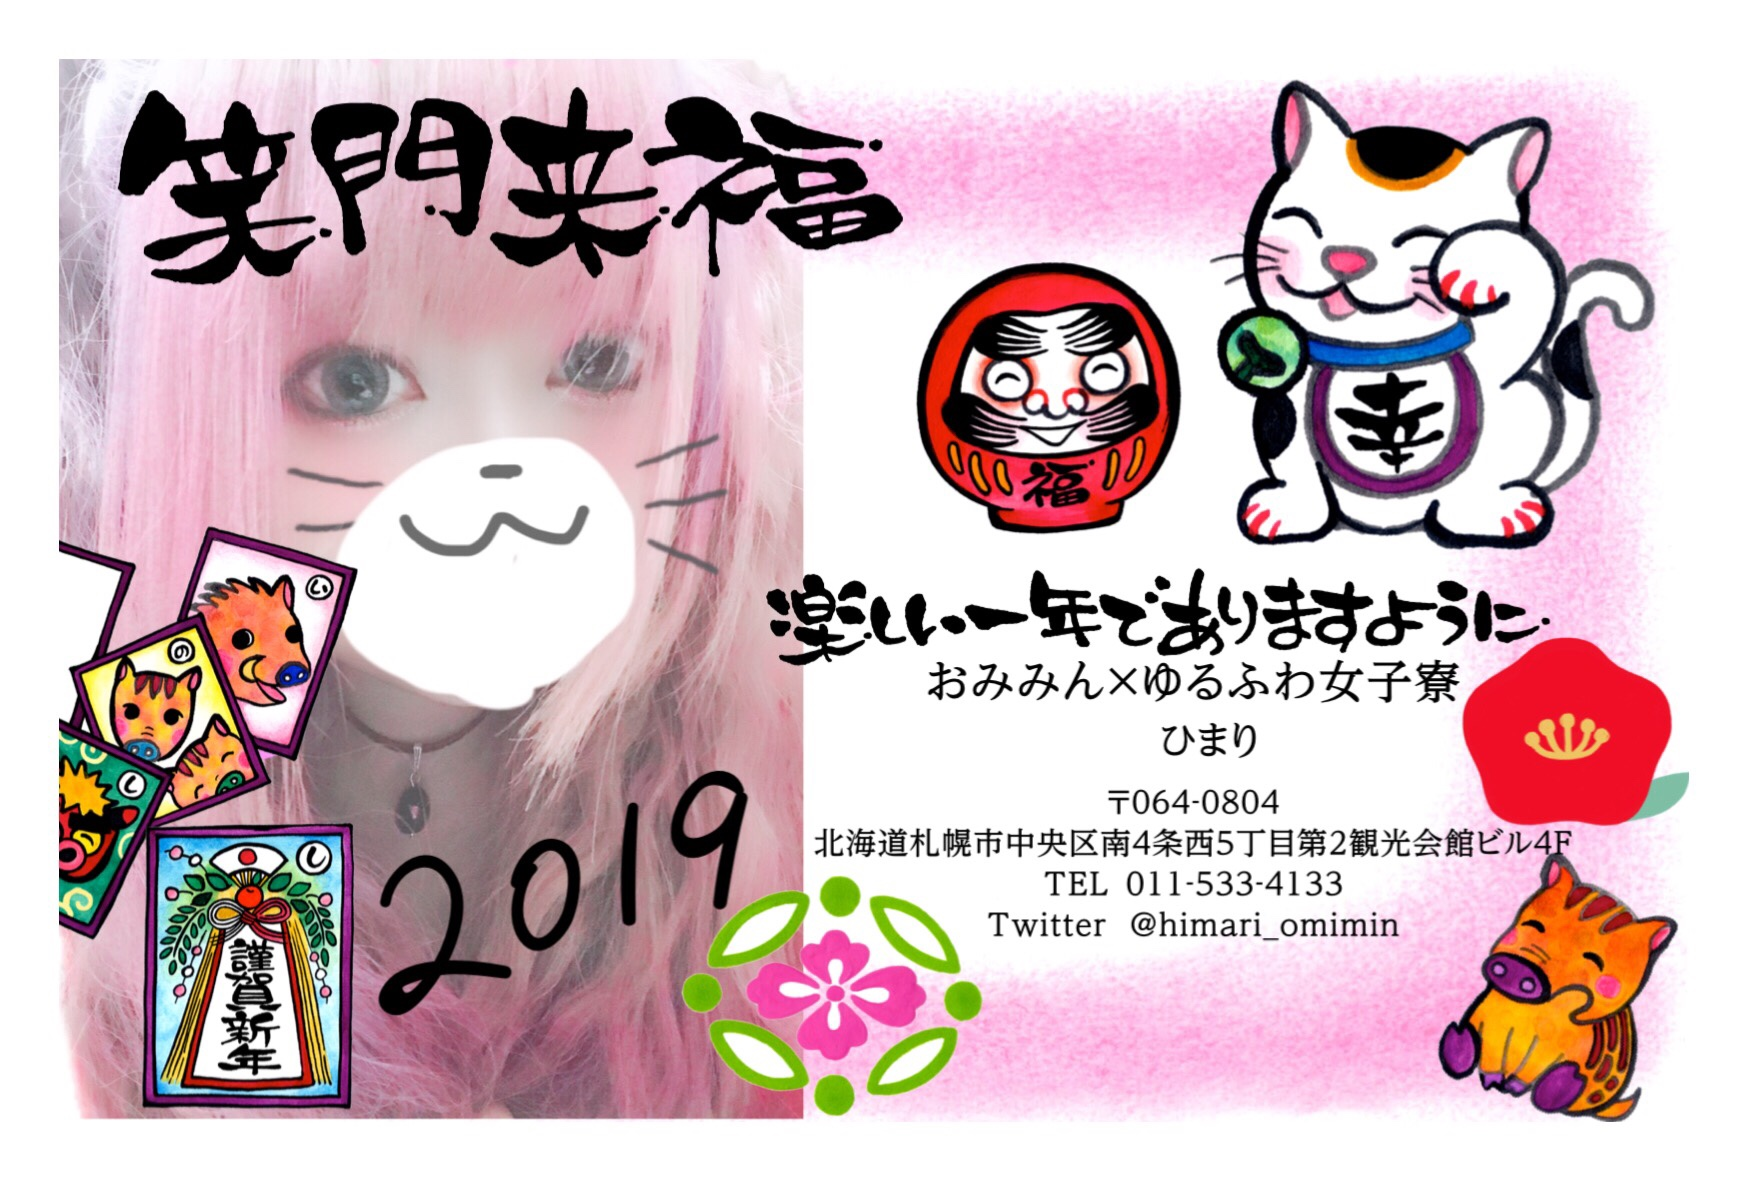 fc2blog_20190111124112251.jpg